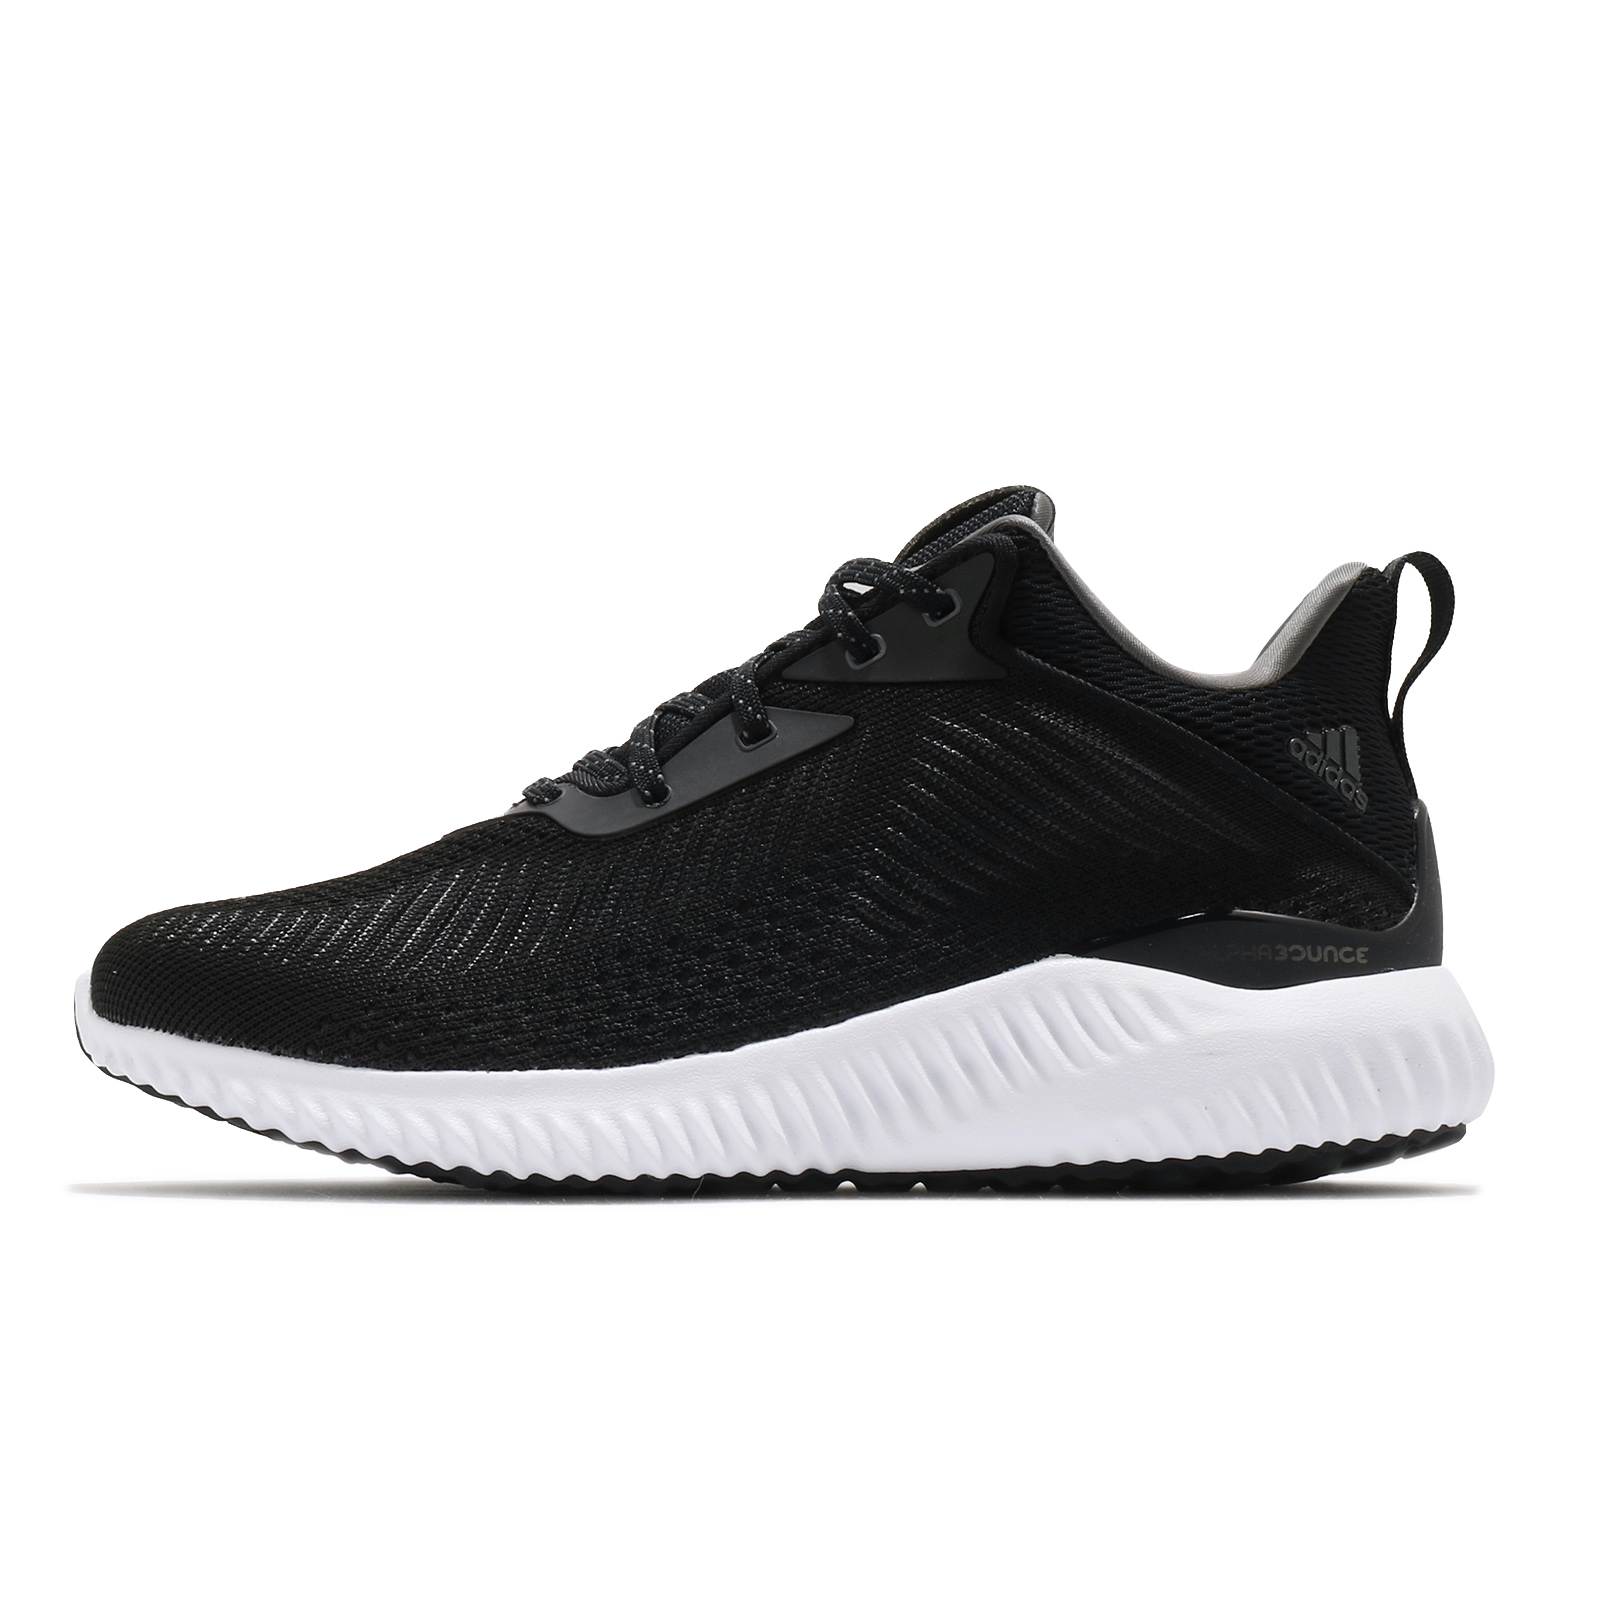 adidas 慢跑鞋 Alphabounce EK 黑 白 Bounce 男鞋 愛迪達 輕量回彈【ACS】 GW2268